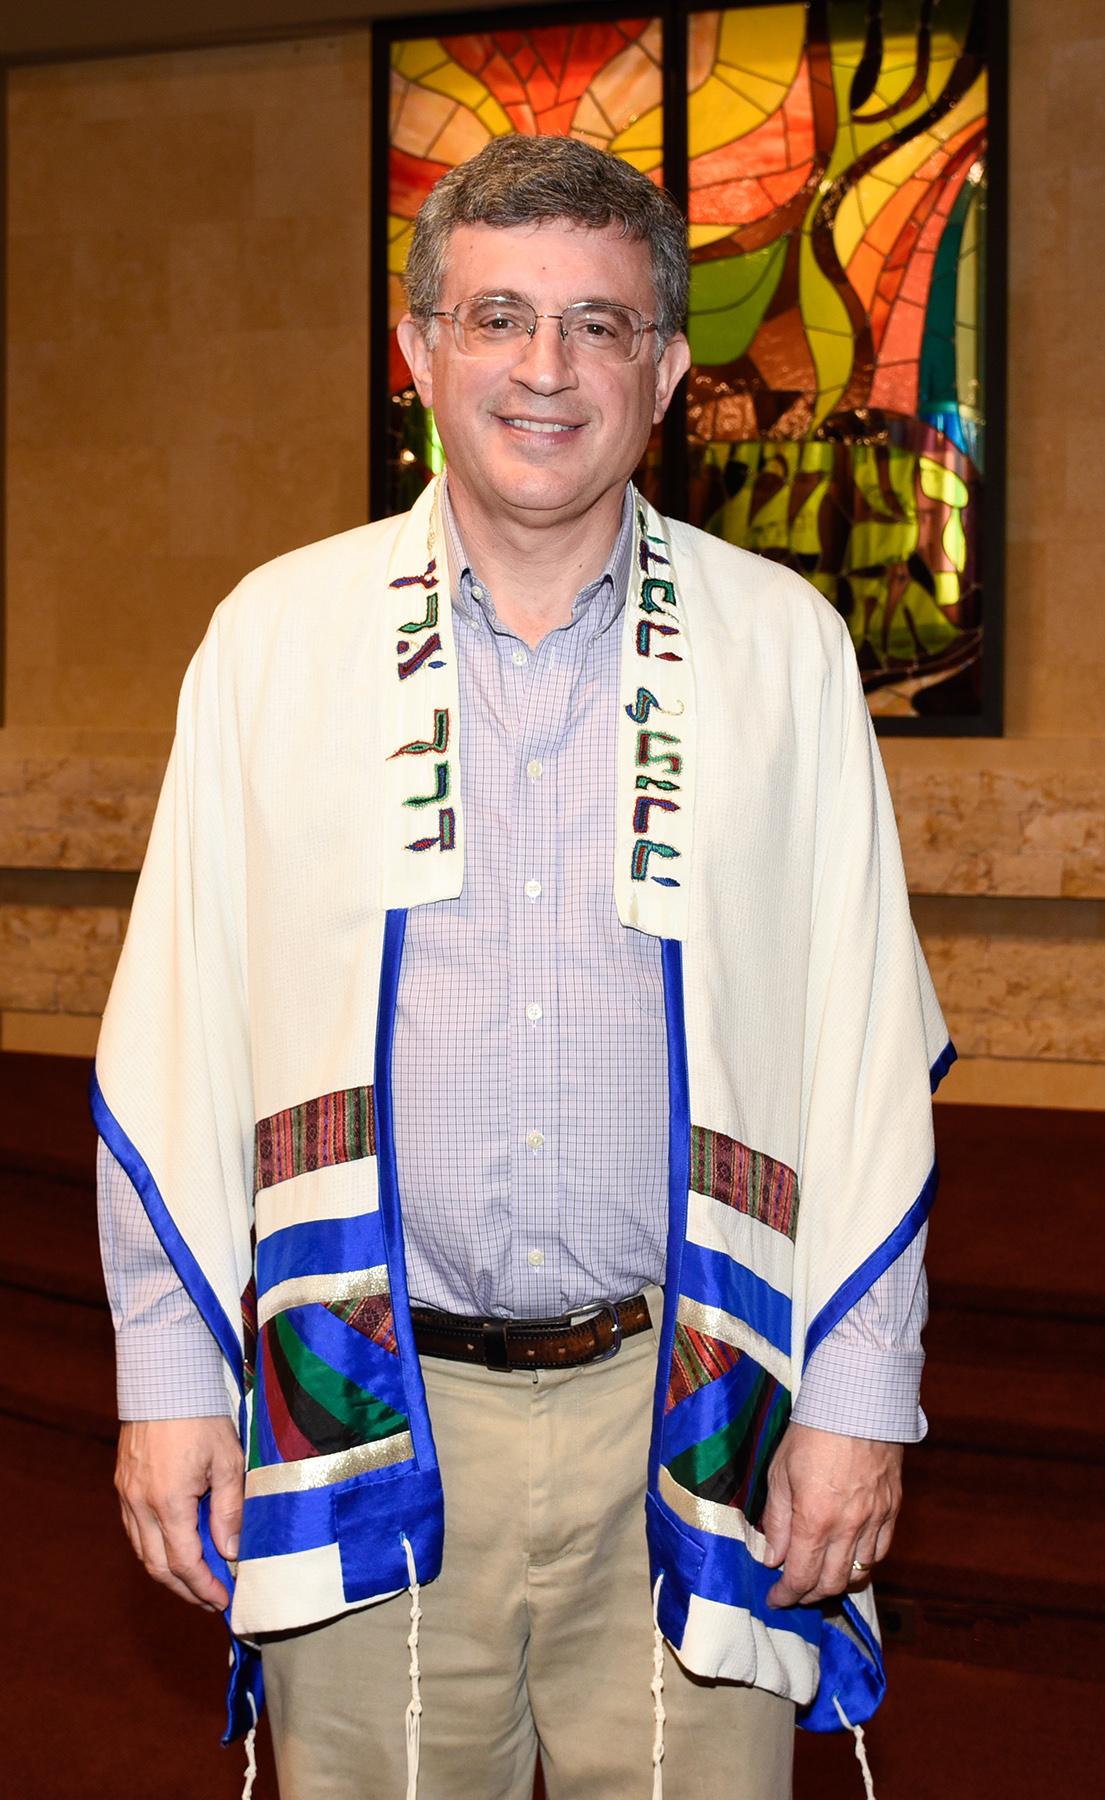 Tallit-Rabbi Shull - photo by Larry M Levine